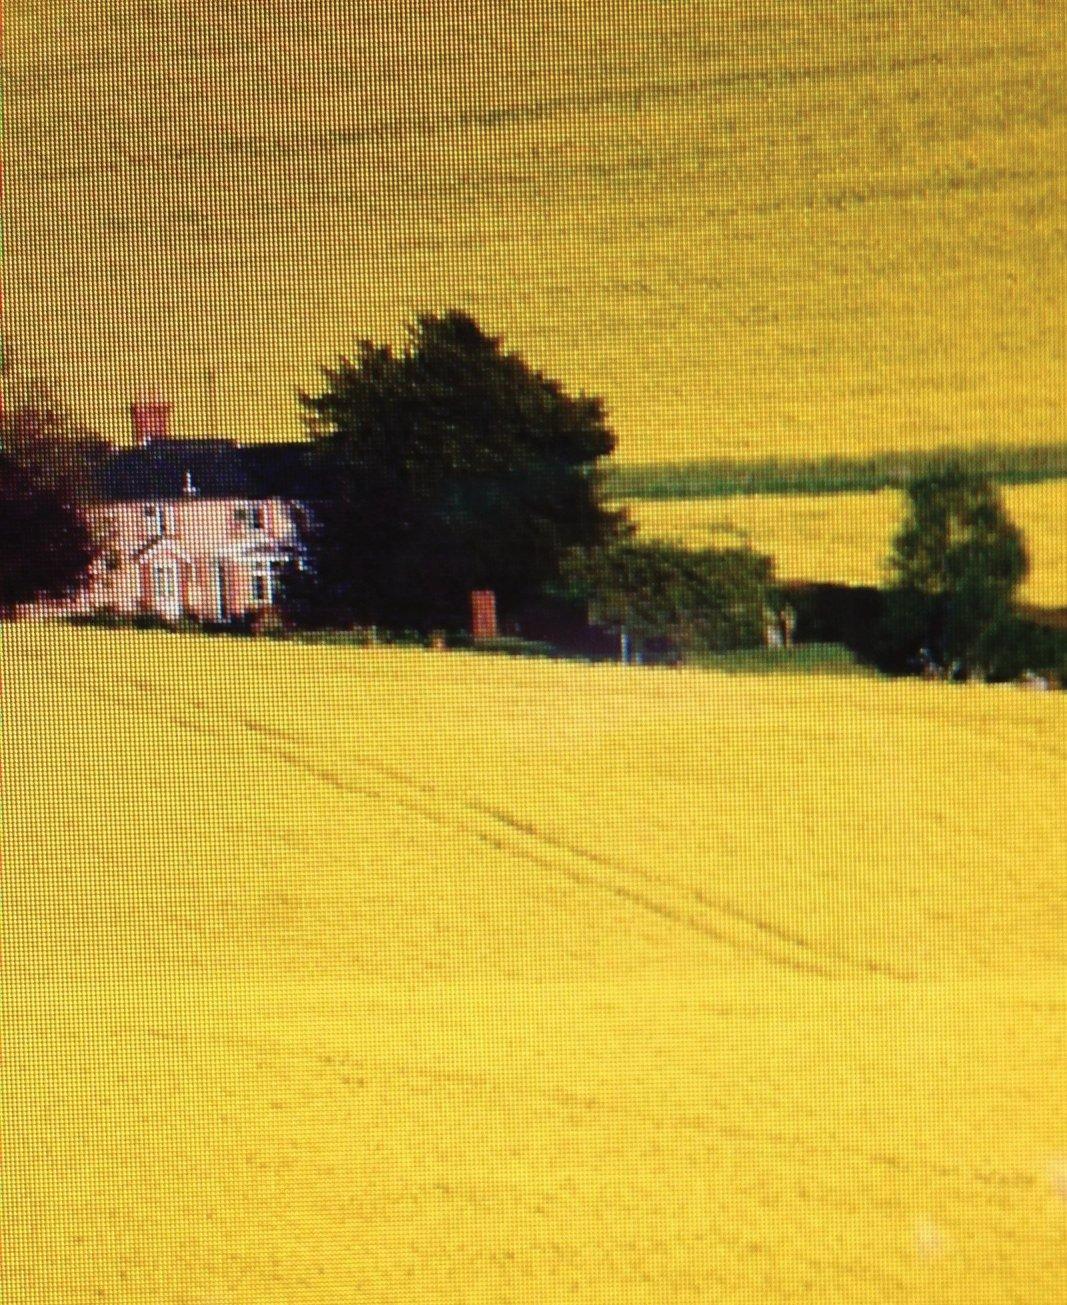 Vast fields of Yellow